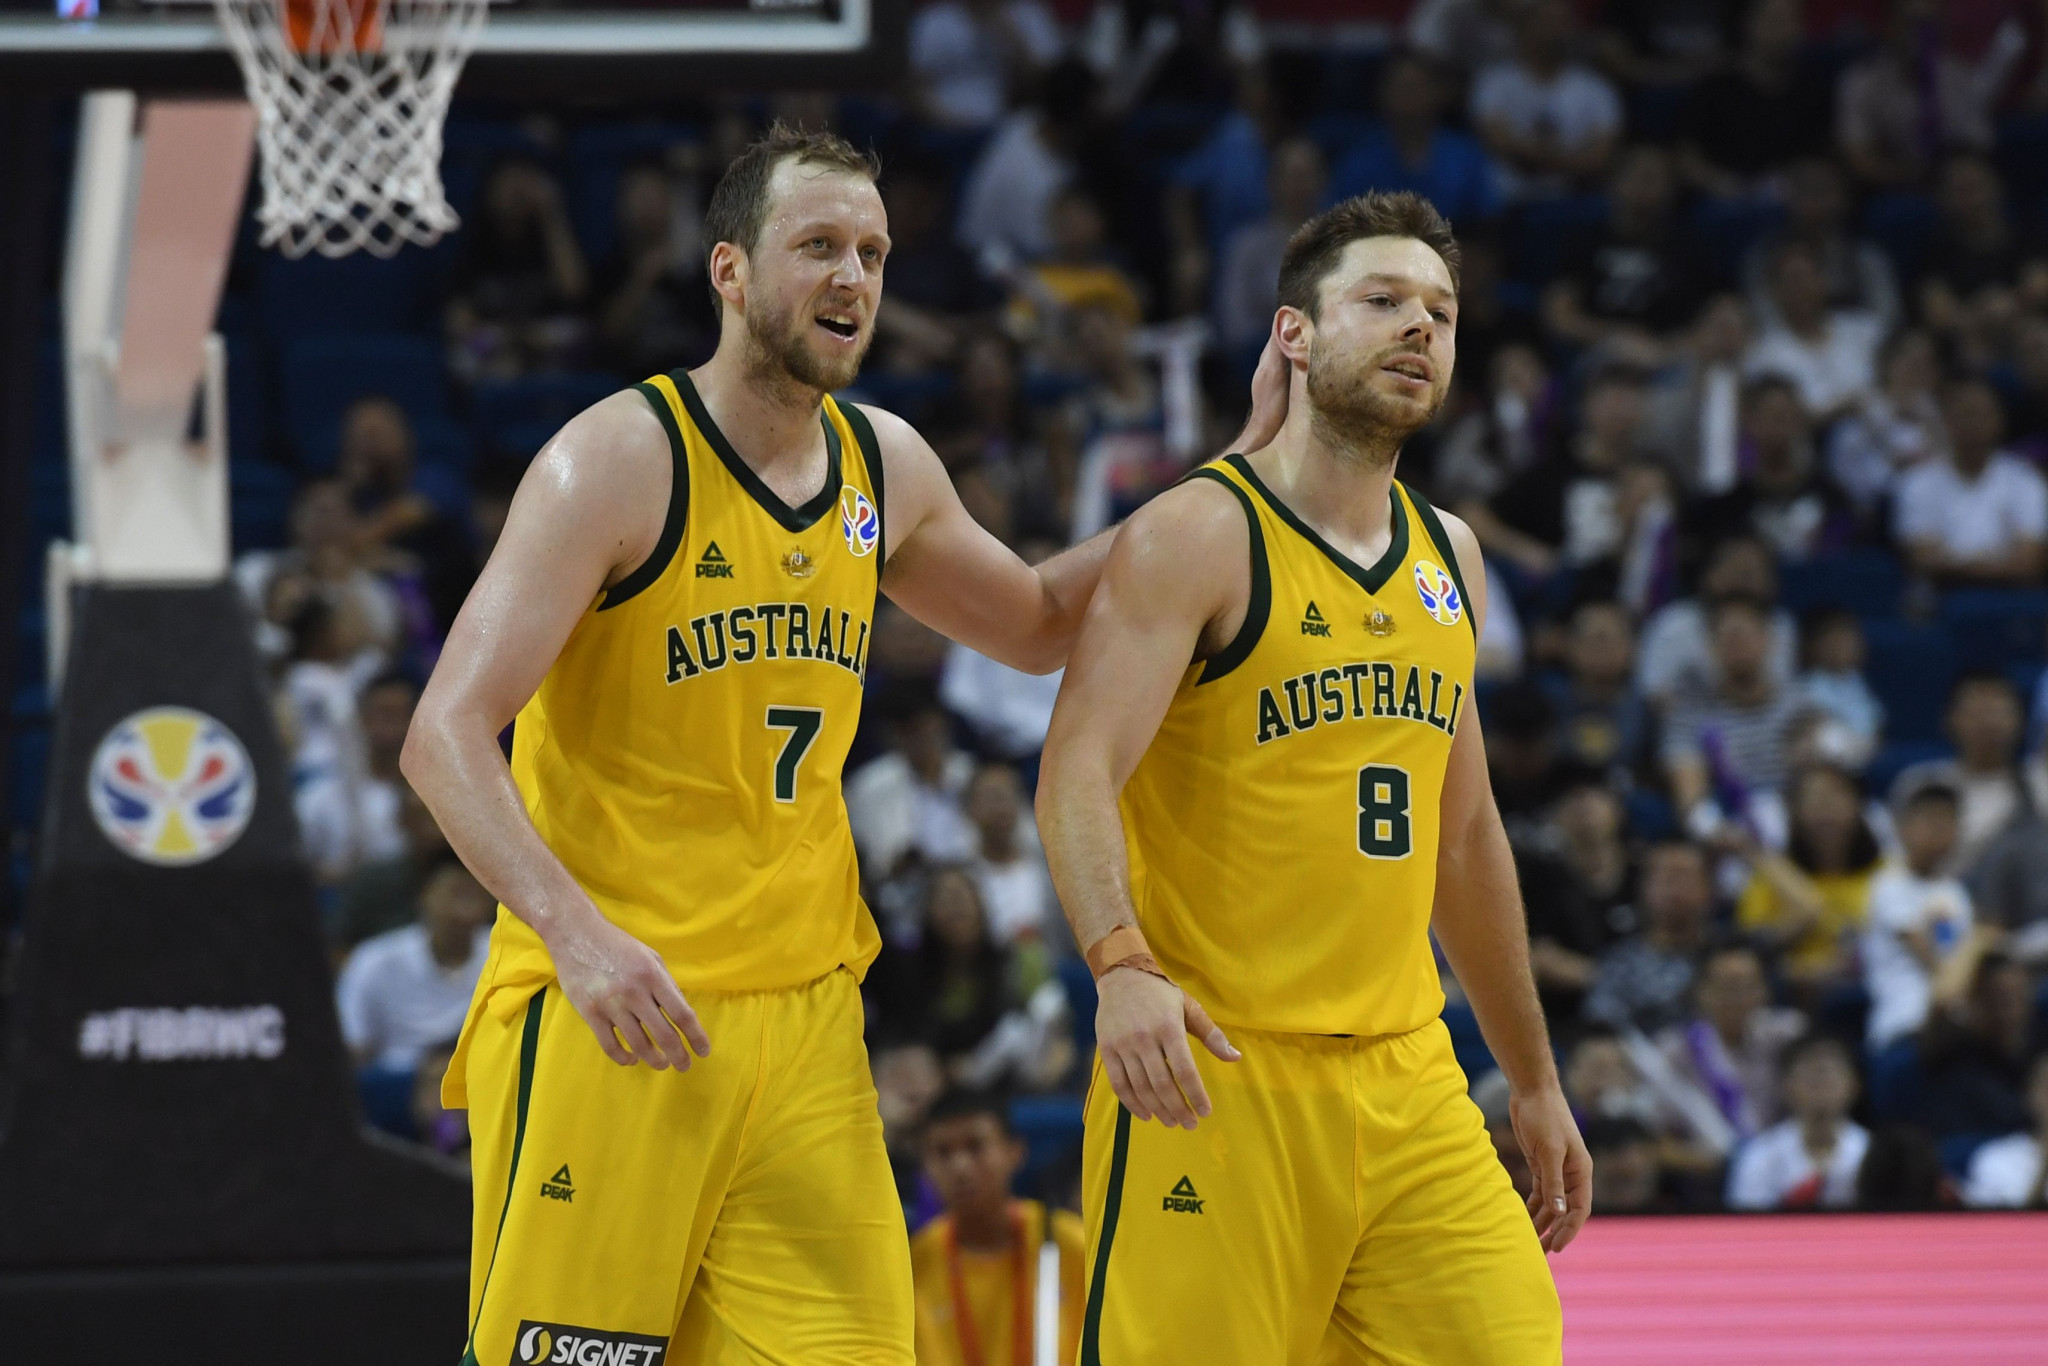 Australia and France seal quarter-final spots at FIBA World Cup